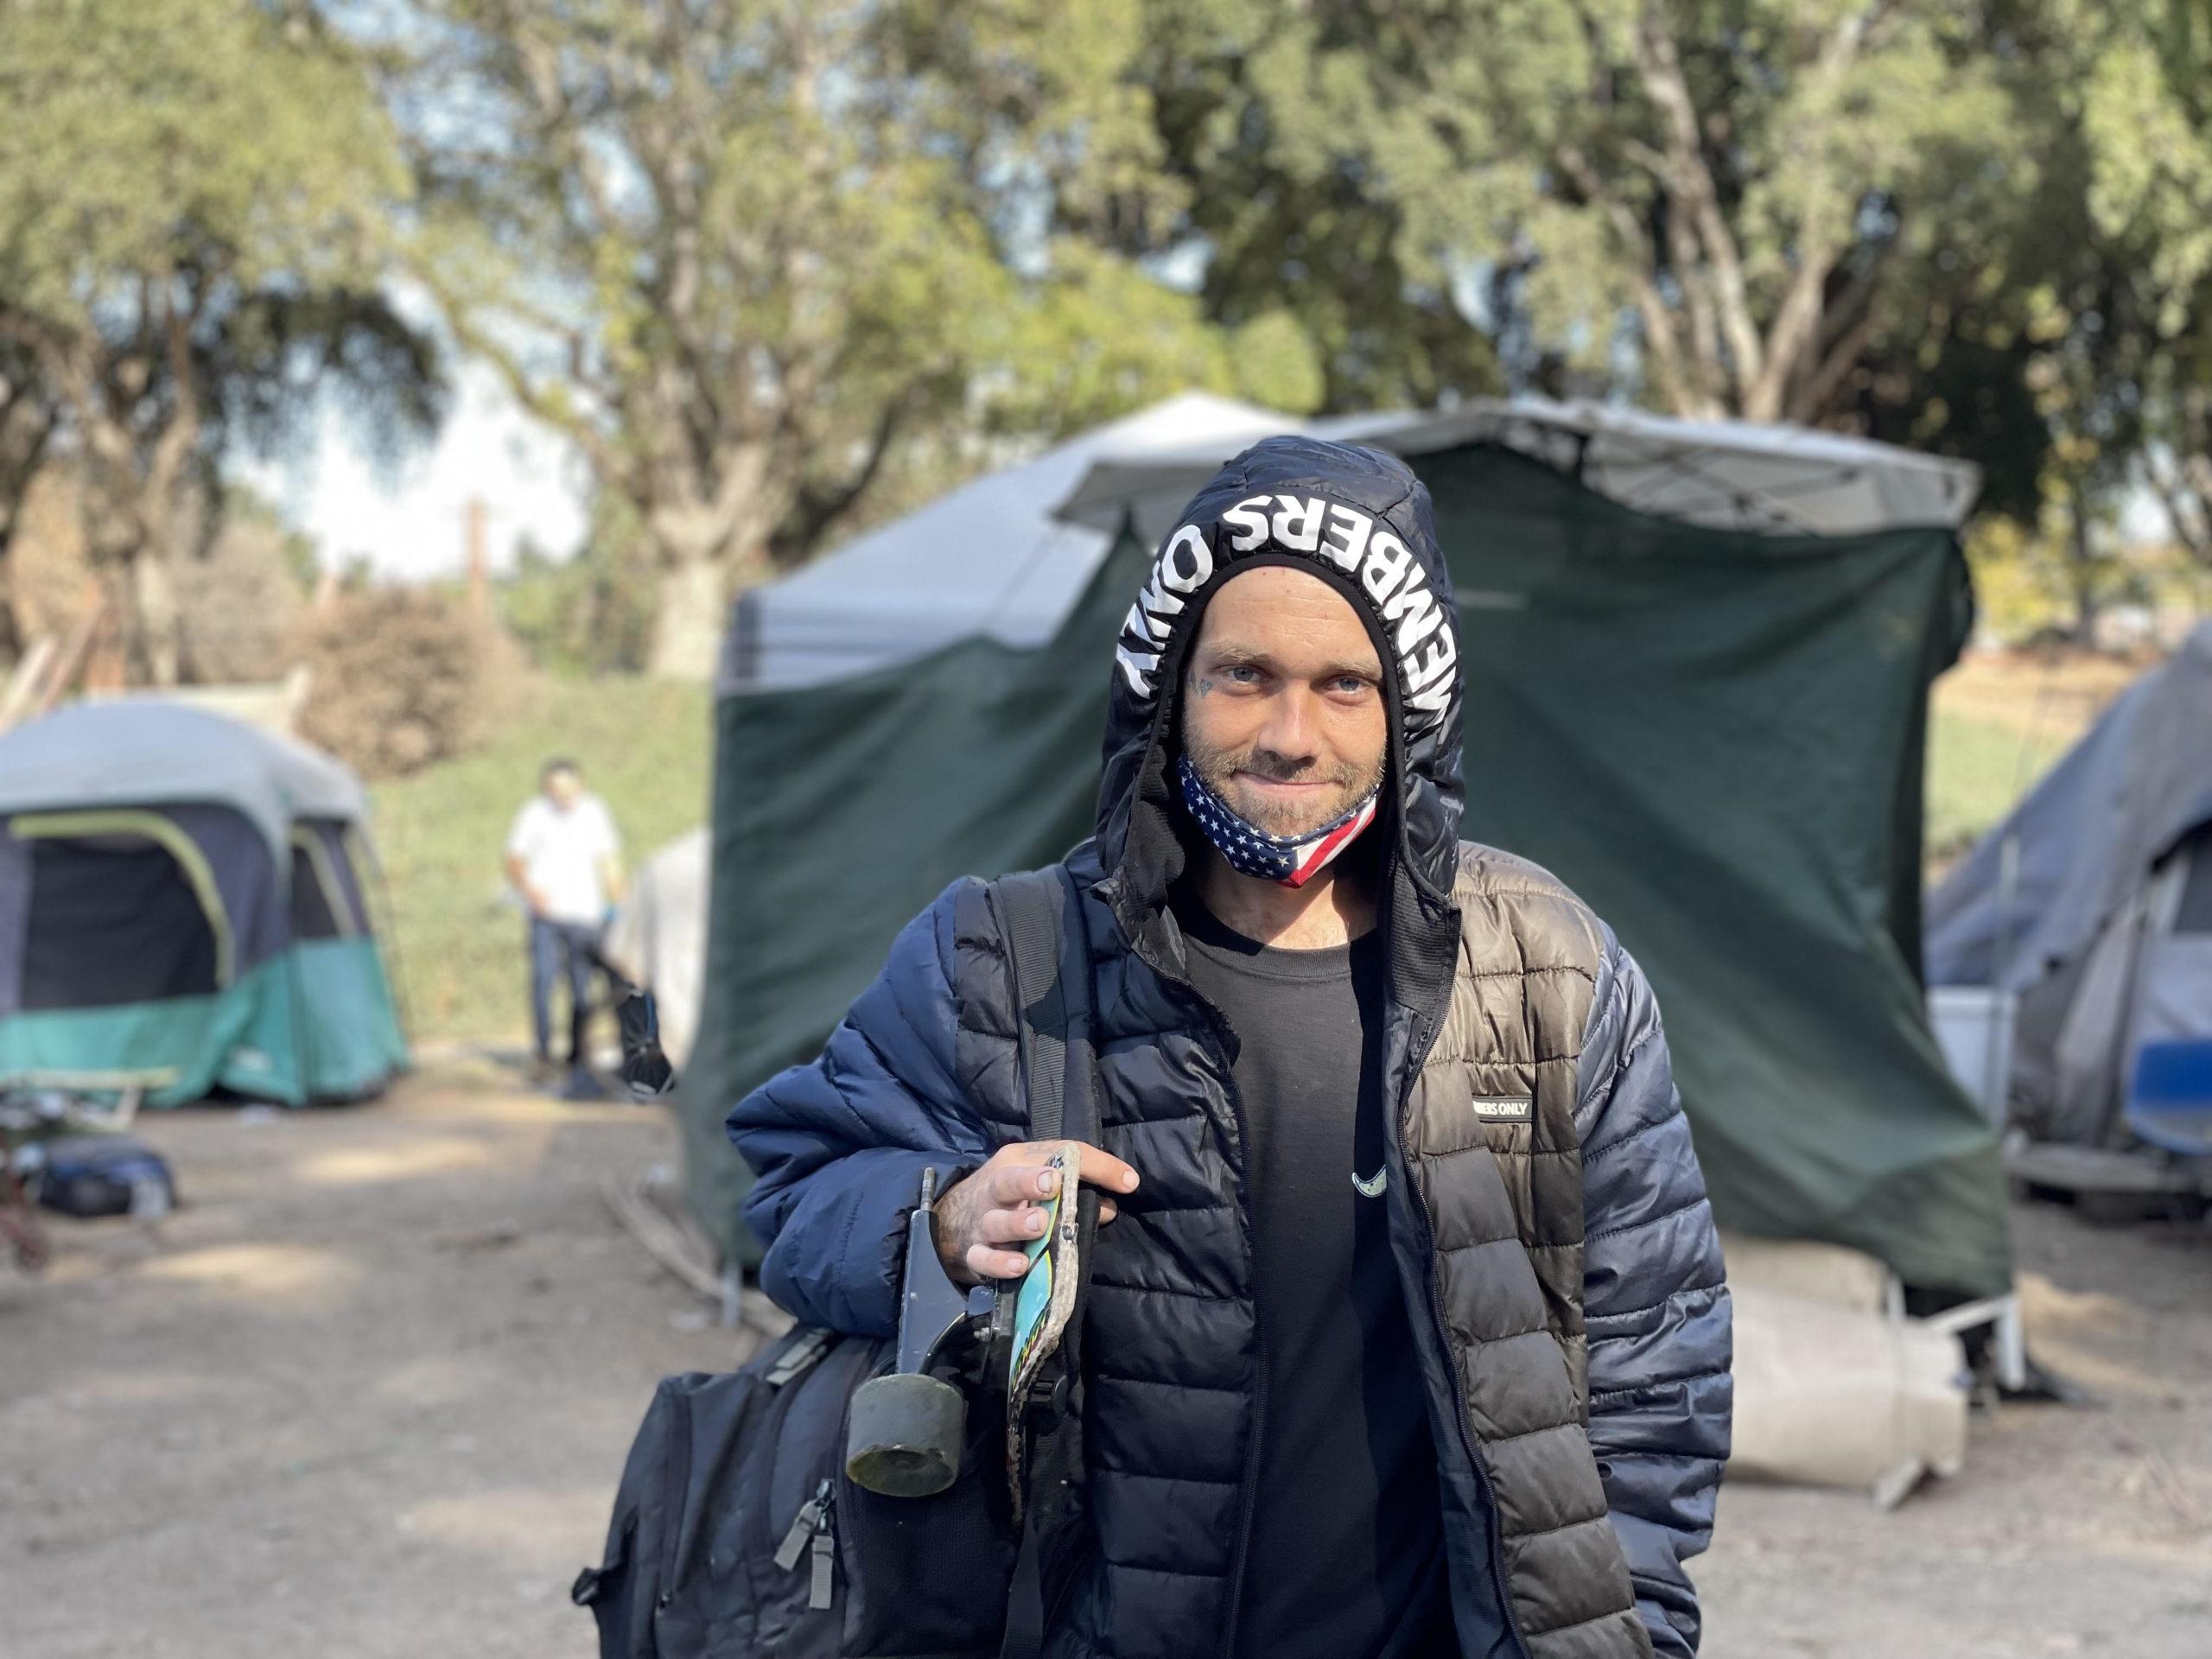 Matthew Hendrix at the Benchlands homeless camp in Santa Cruz